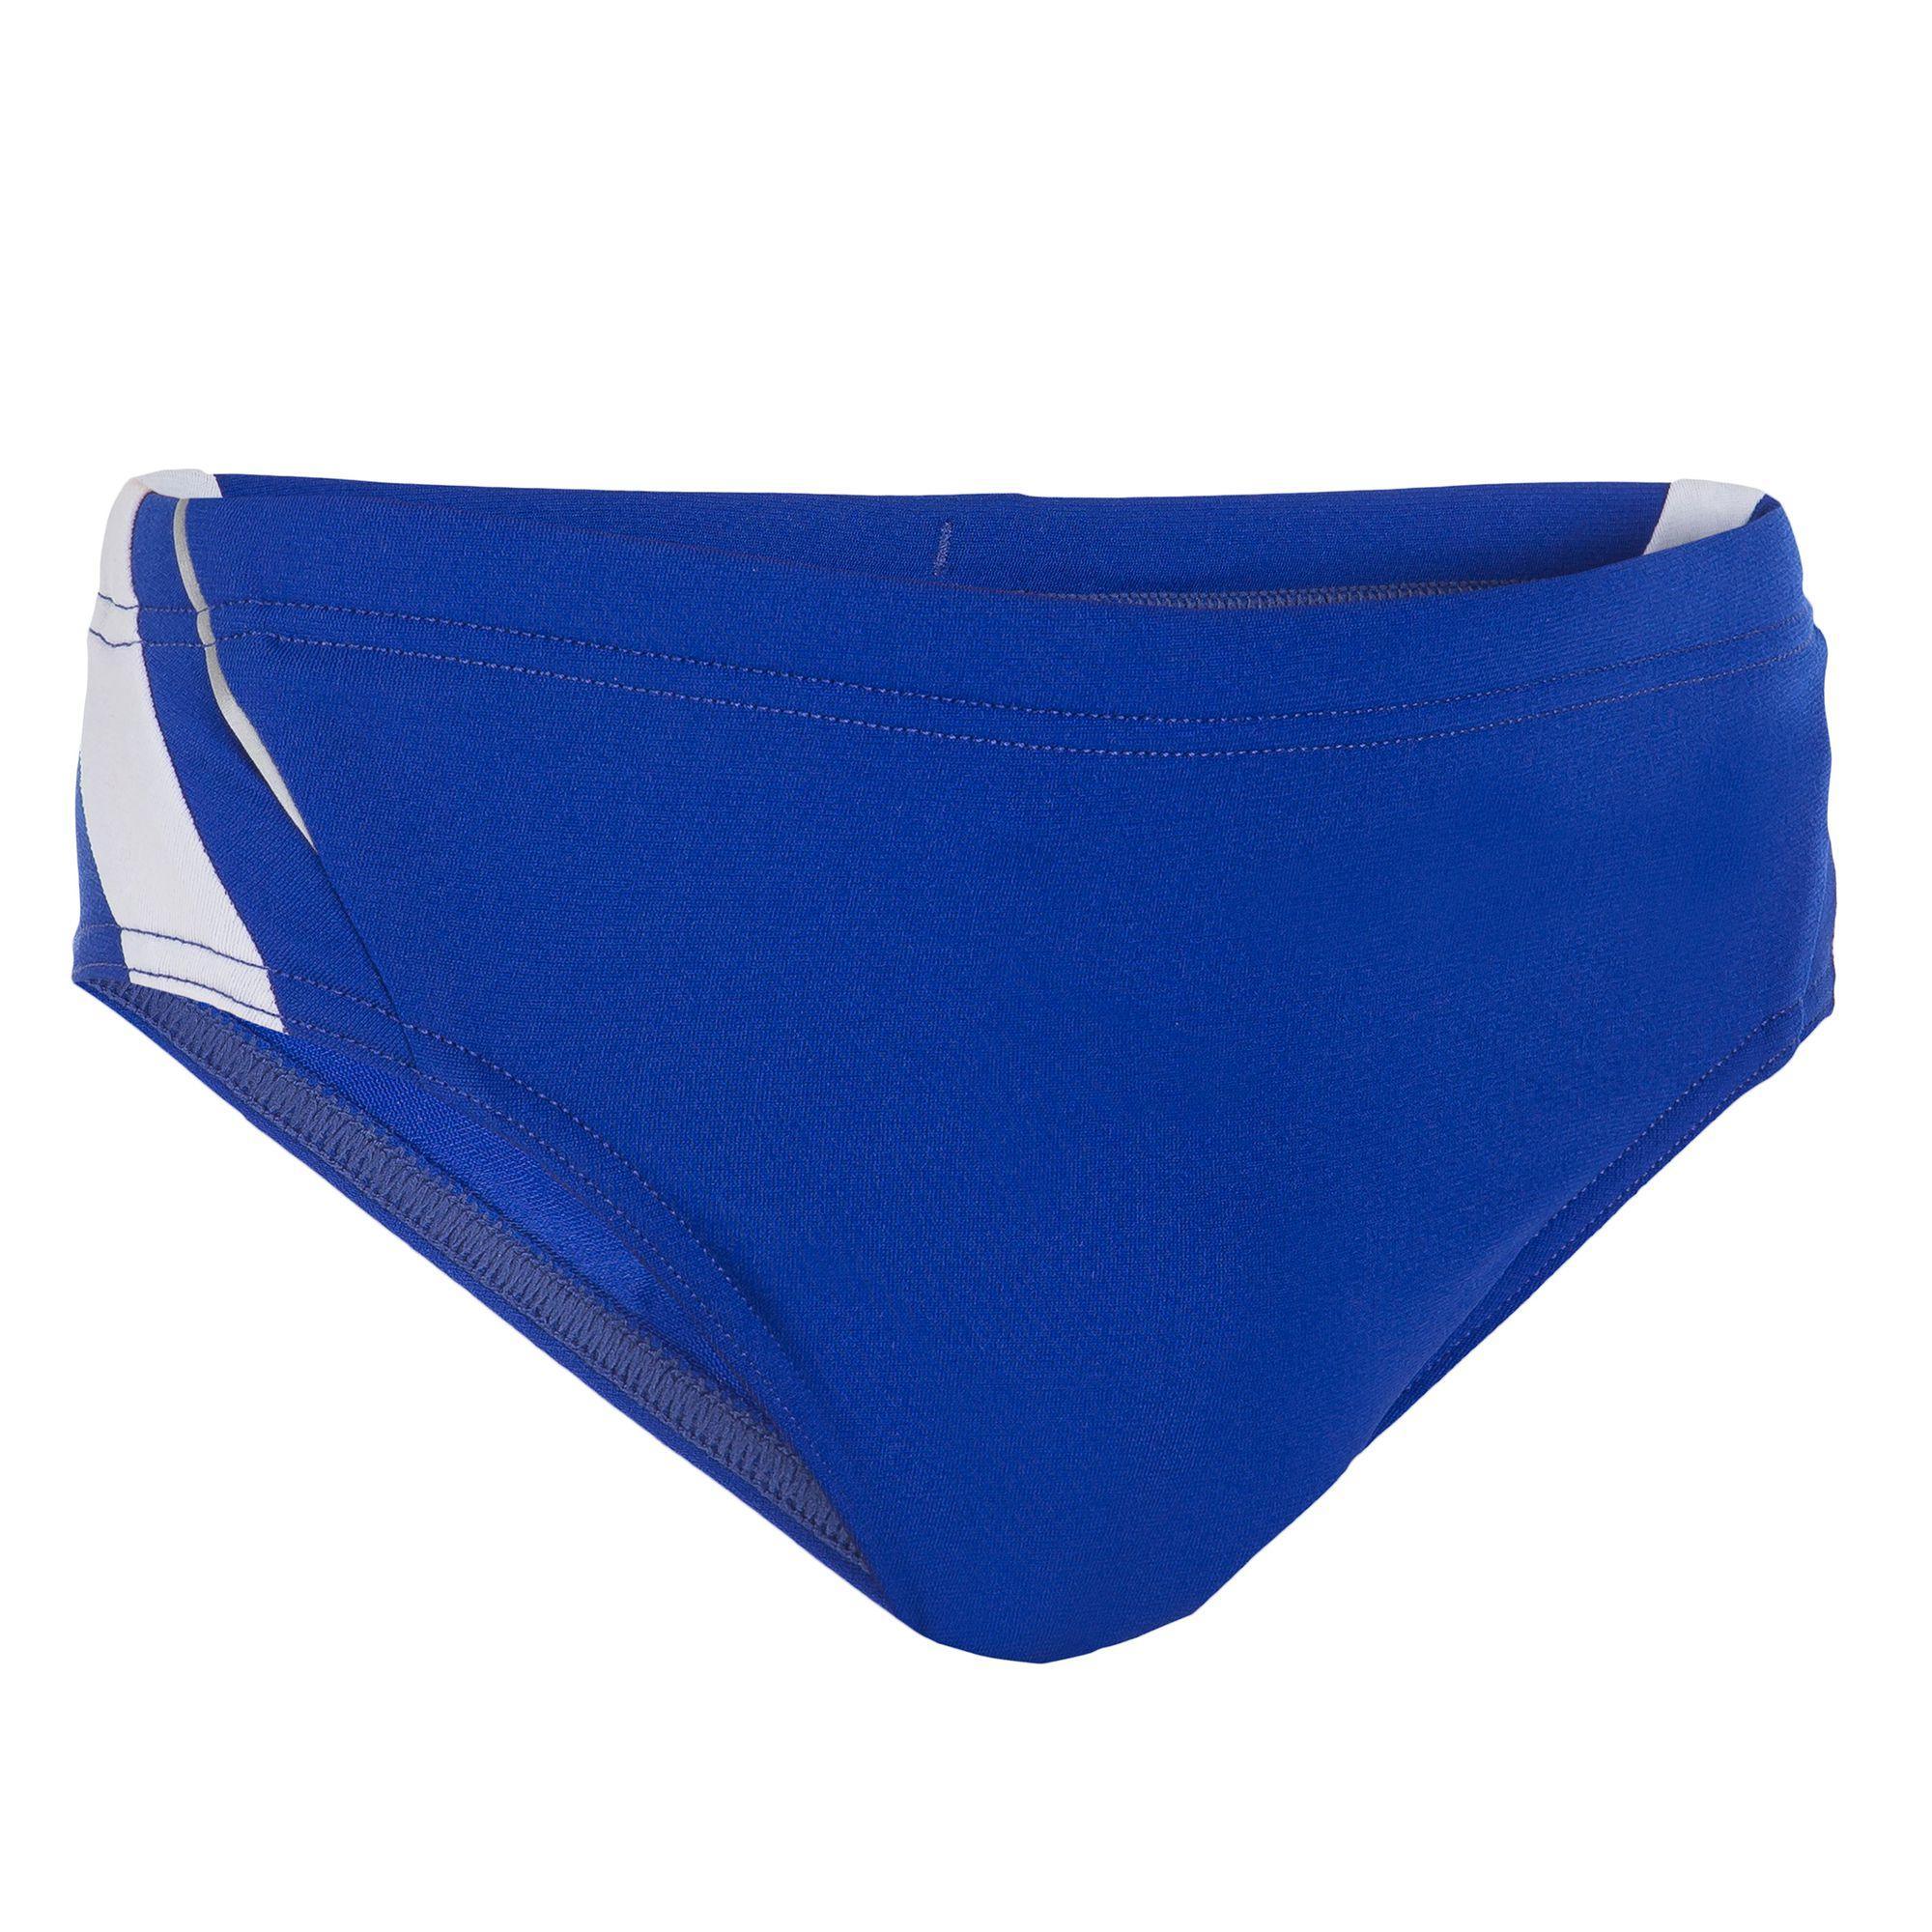 maillot de bain garcon slip b sporty yoke bleu blanc nabaiji. Black Bedroom Furniture Sets. Home Design Ideas